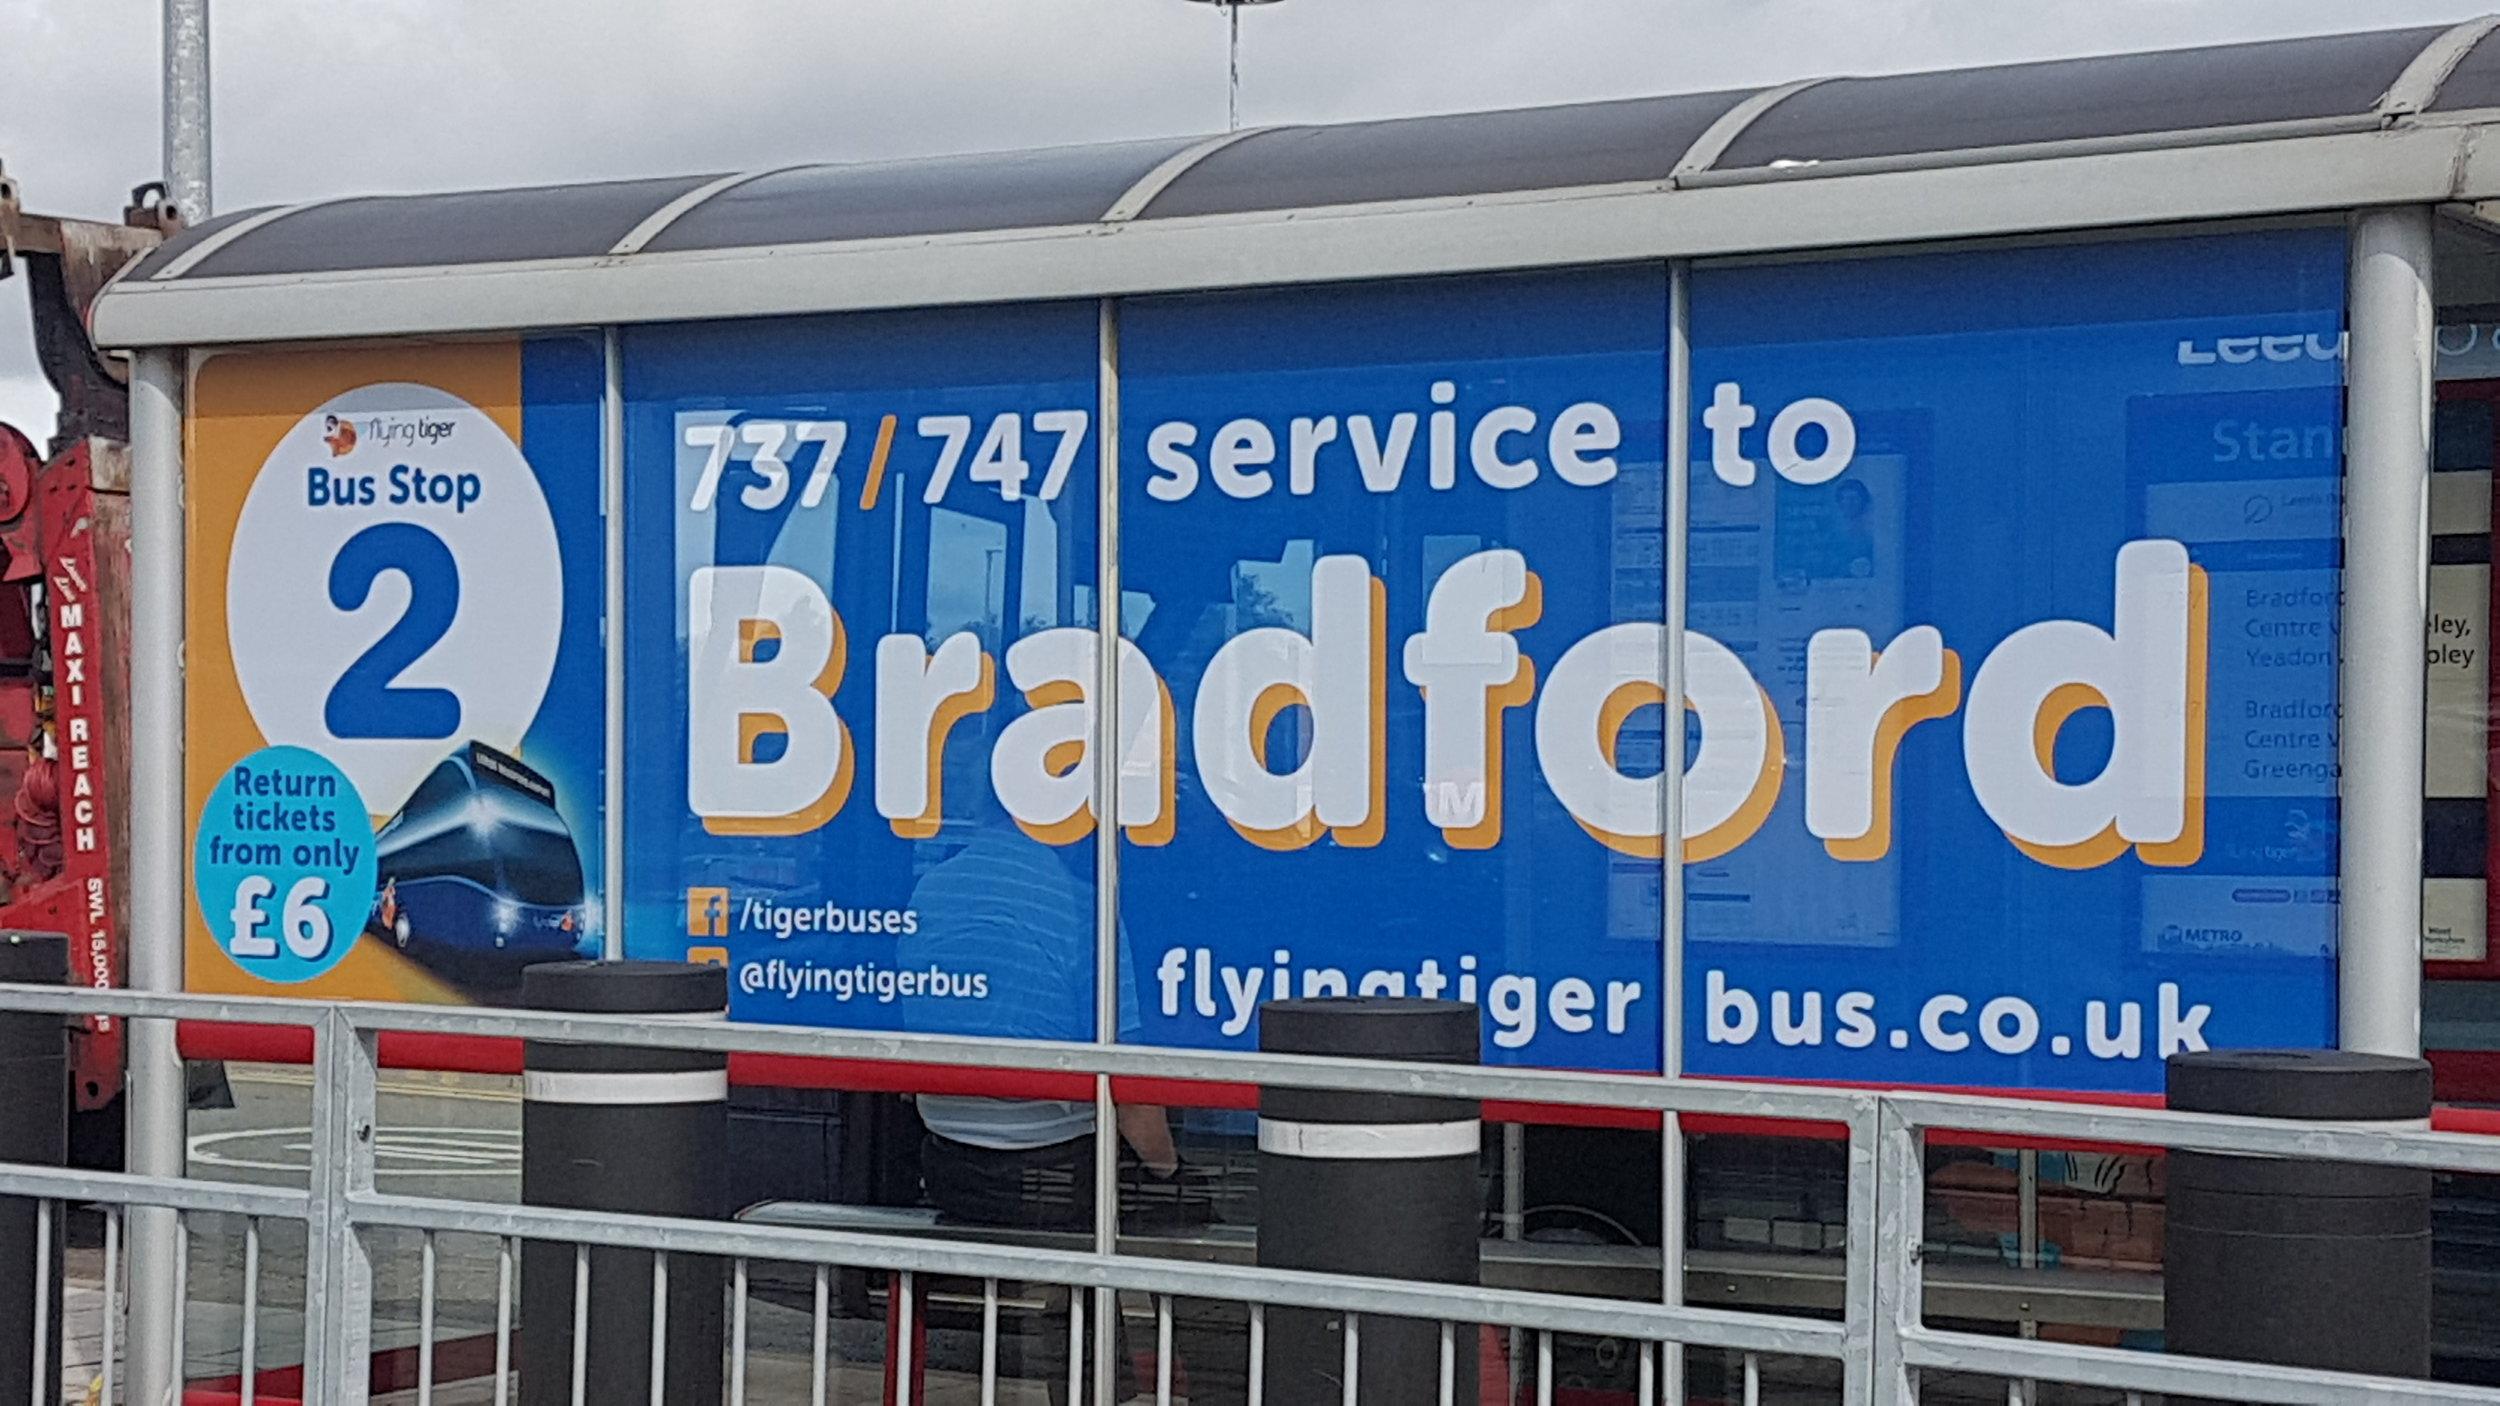 ARRIVA LEEDS BRADFORD AIRPORT   Large format digitally printed window graphics.